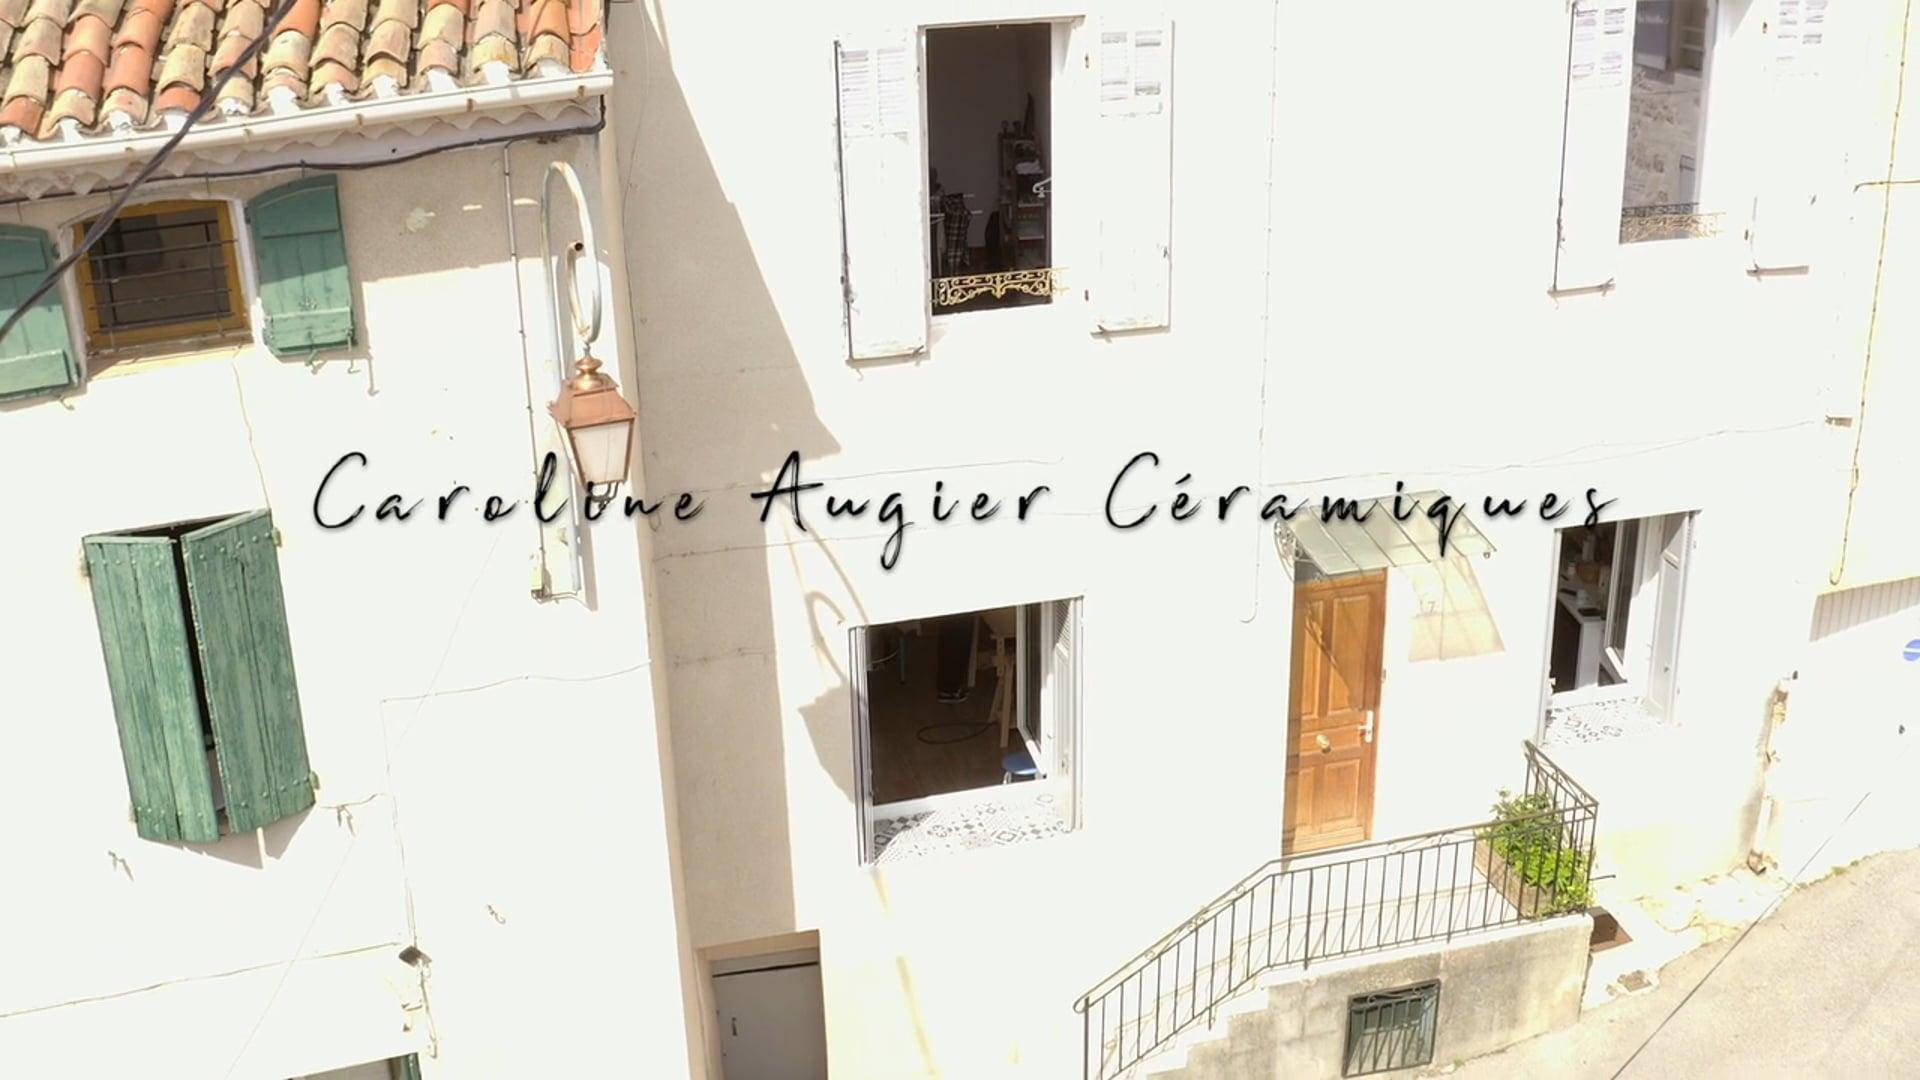 Caroline Augier Céramiques